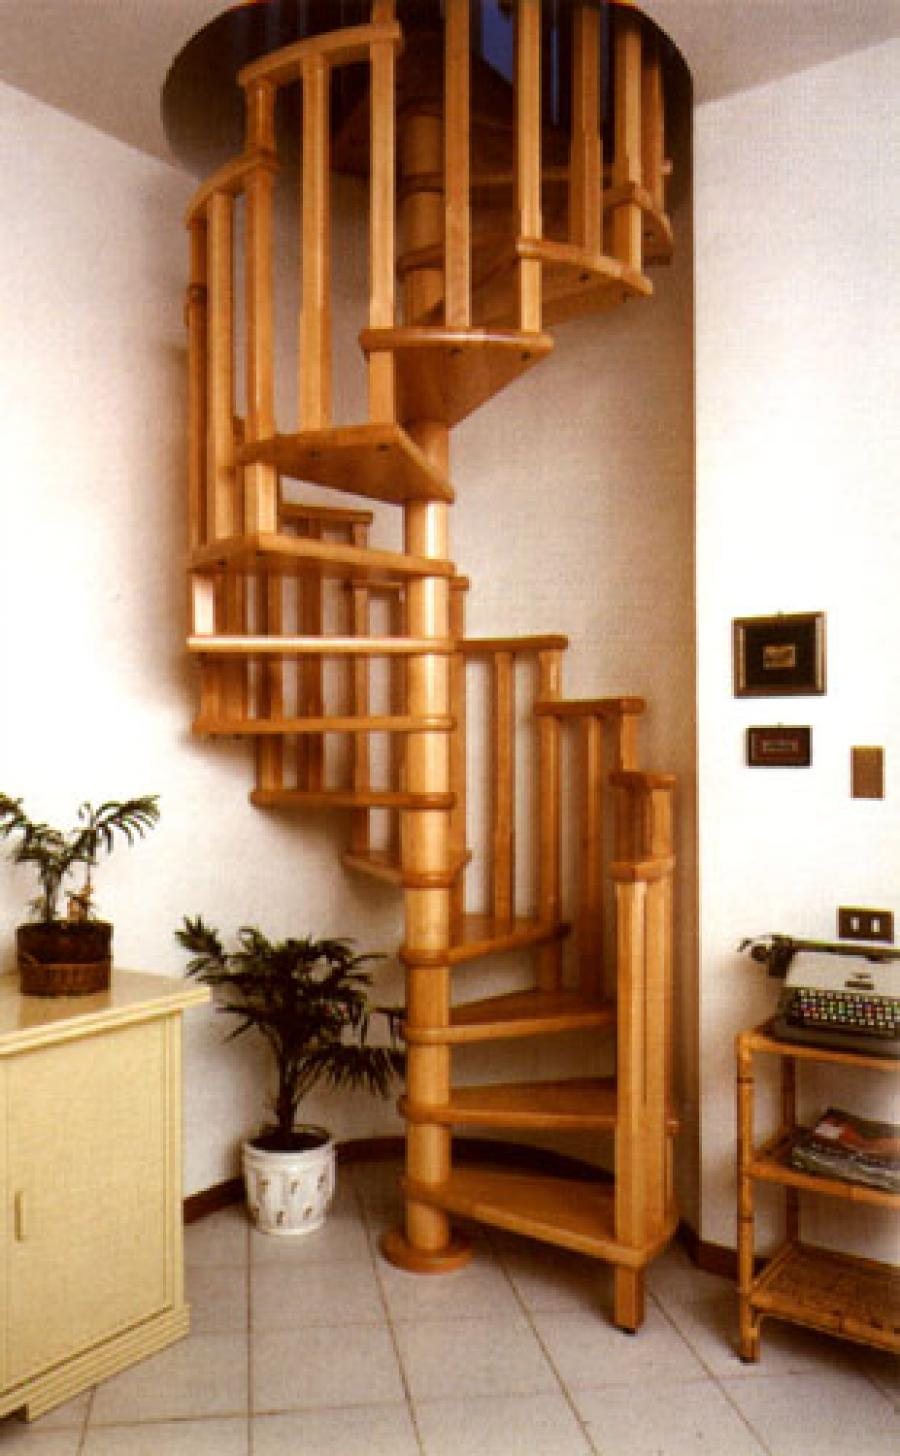 Escaleras De Caracol Madera Affordable Fotos With Escaleras De  ~ Precios De Escaleras De Caracol